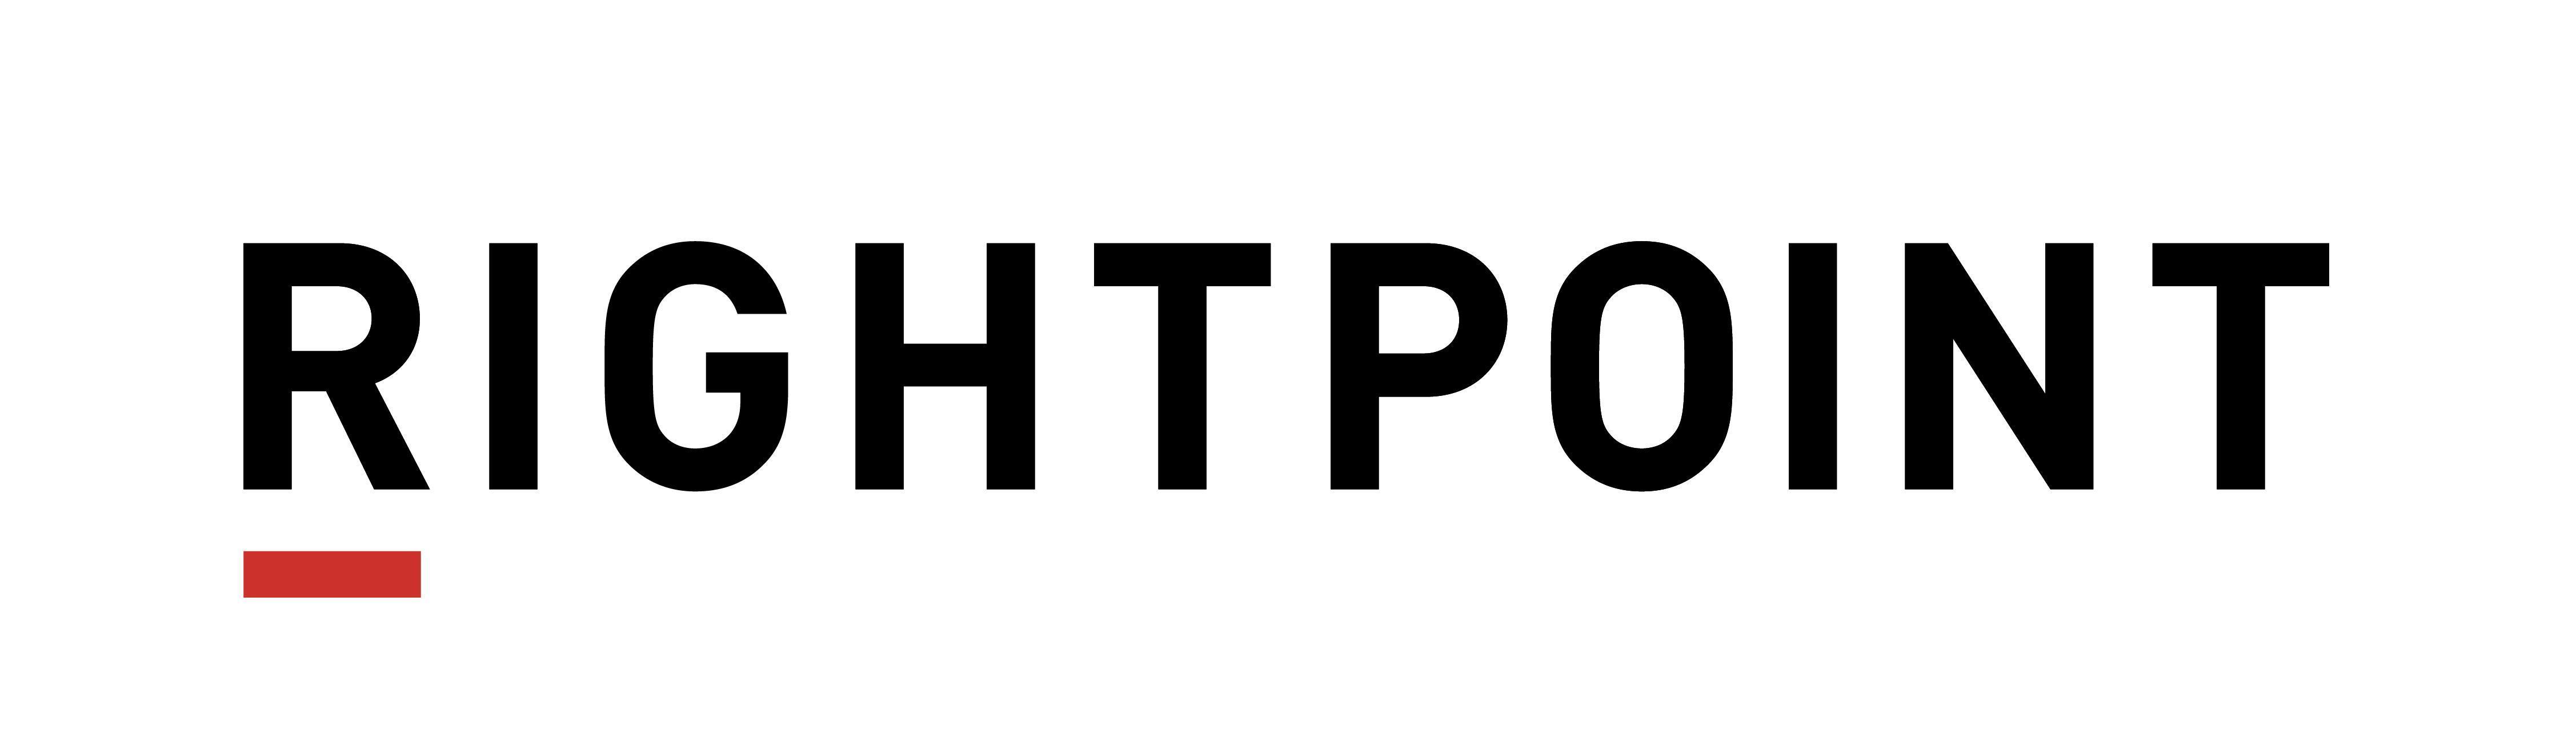 right point logo